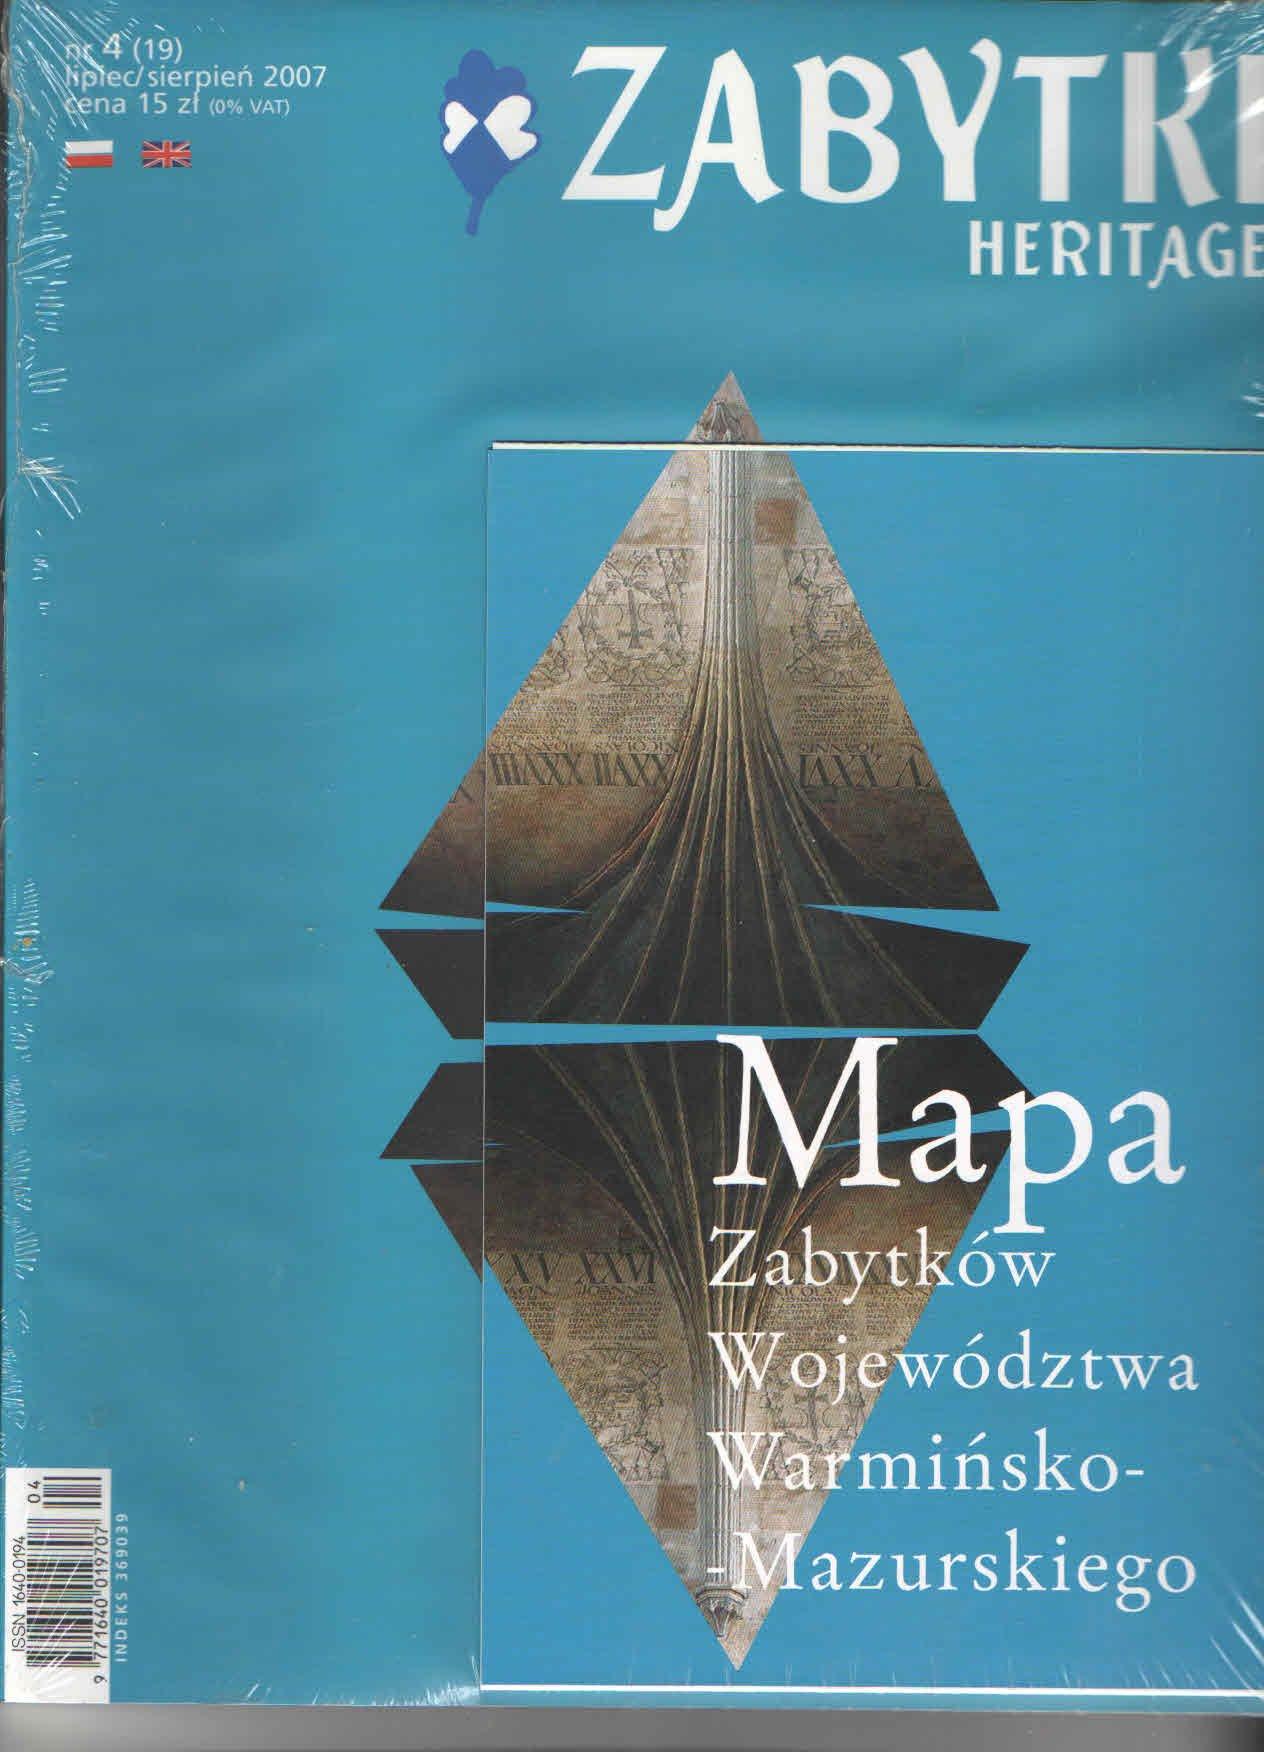 ZABYTKI heritage nr 4(19) 2007 warmińsko-mazurskie